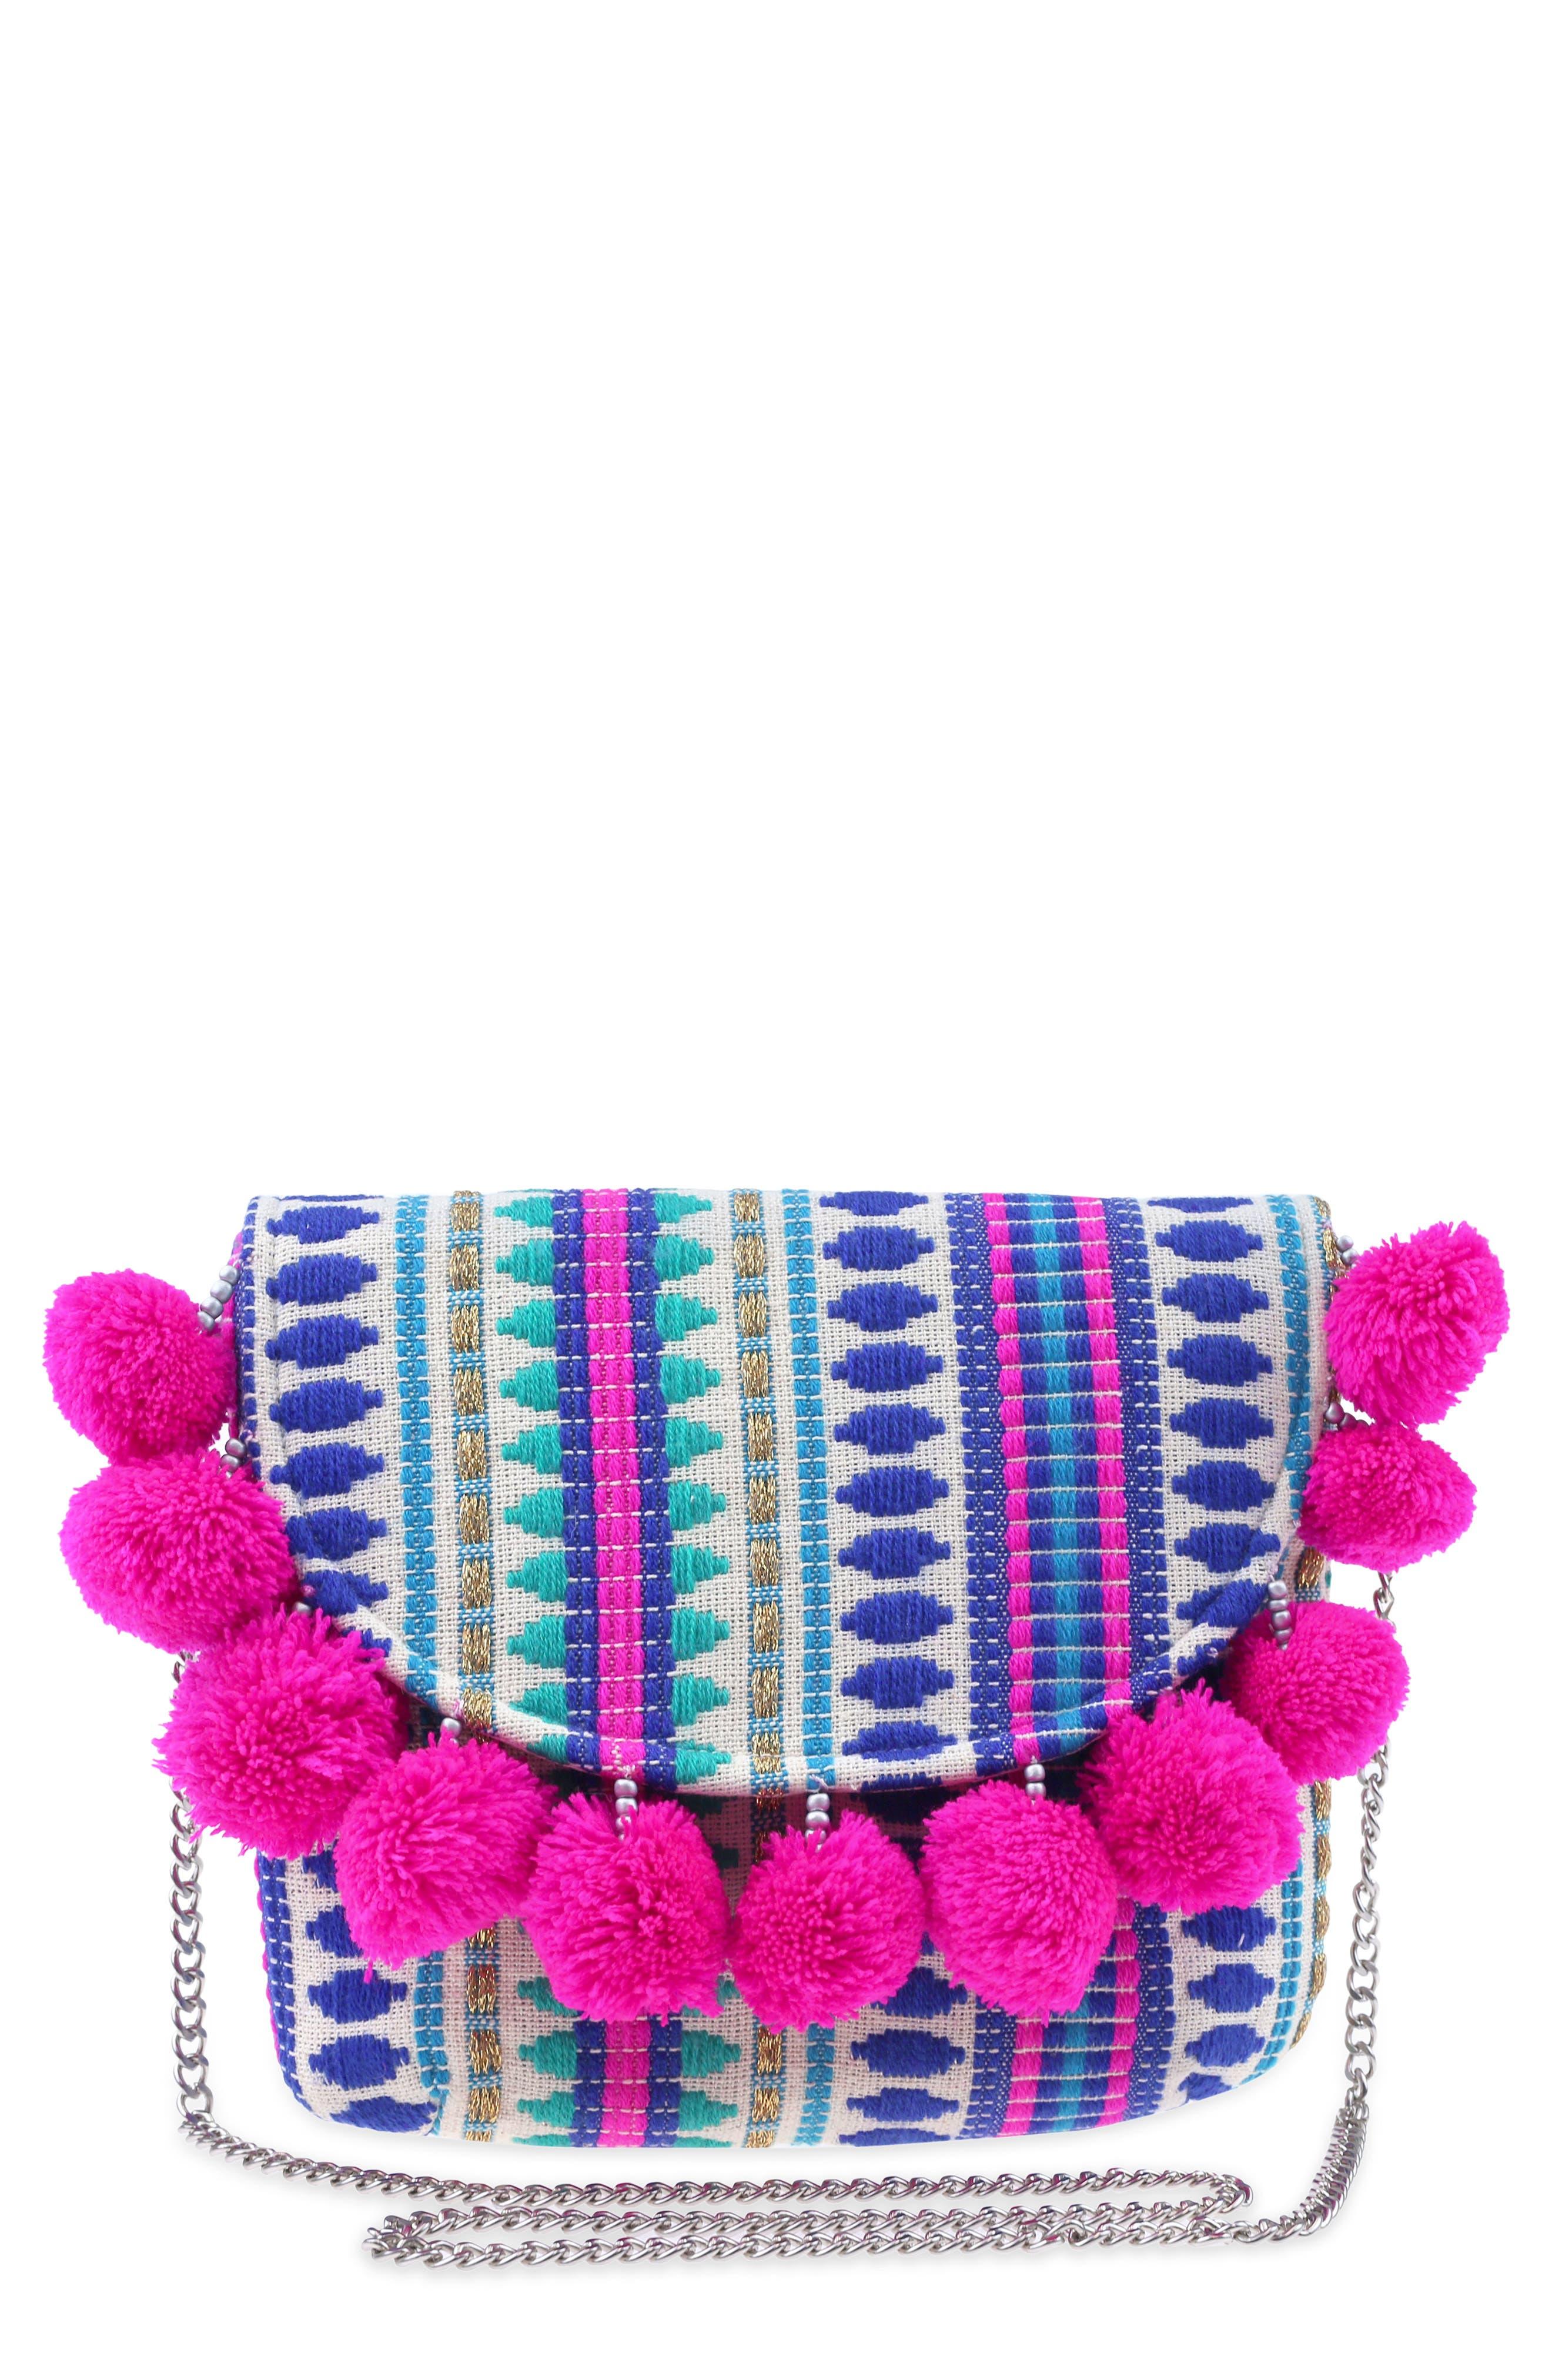 Embroidered Crossbody Bag,                             Main thumbnail 1, color,